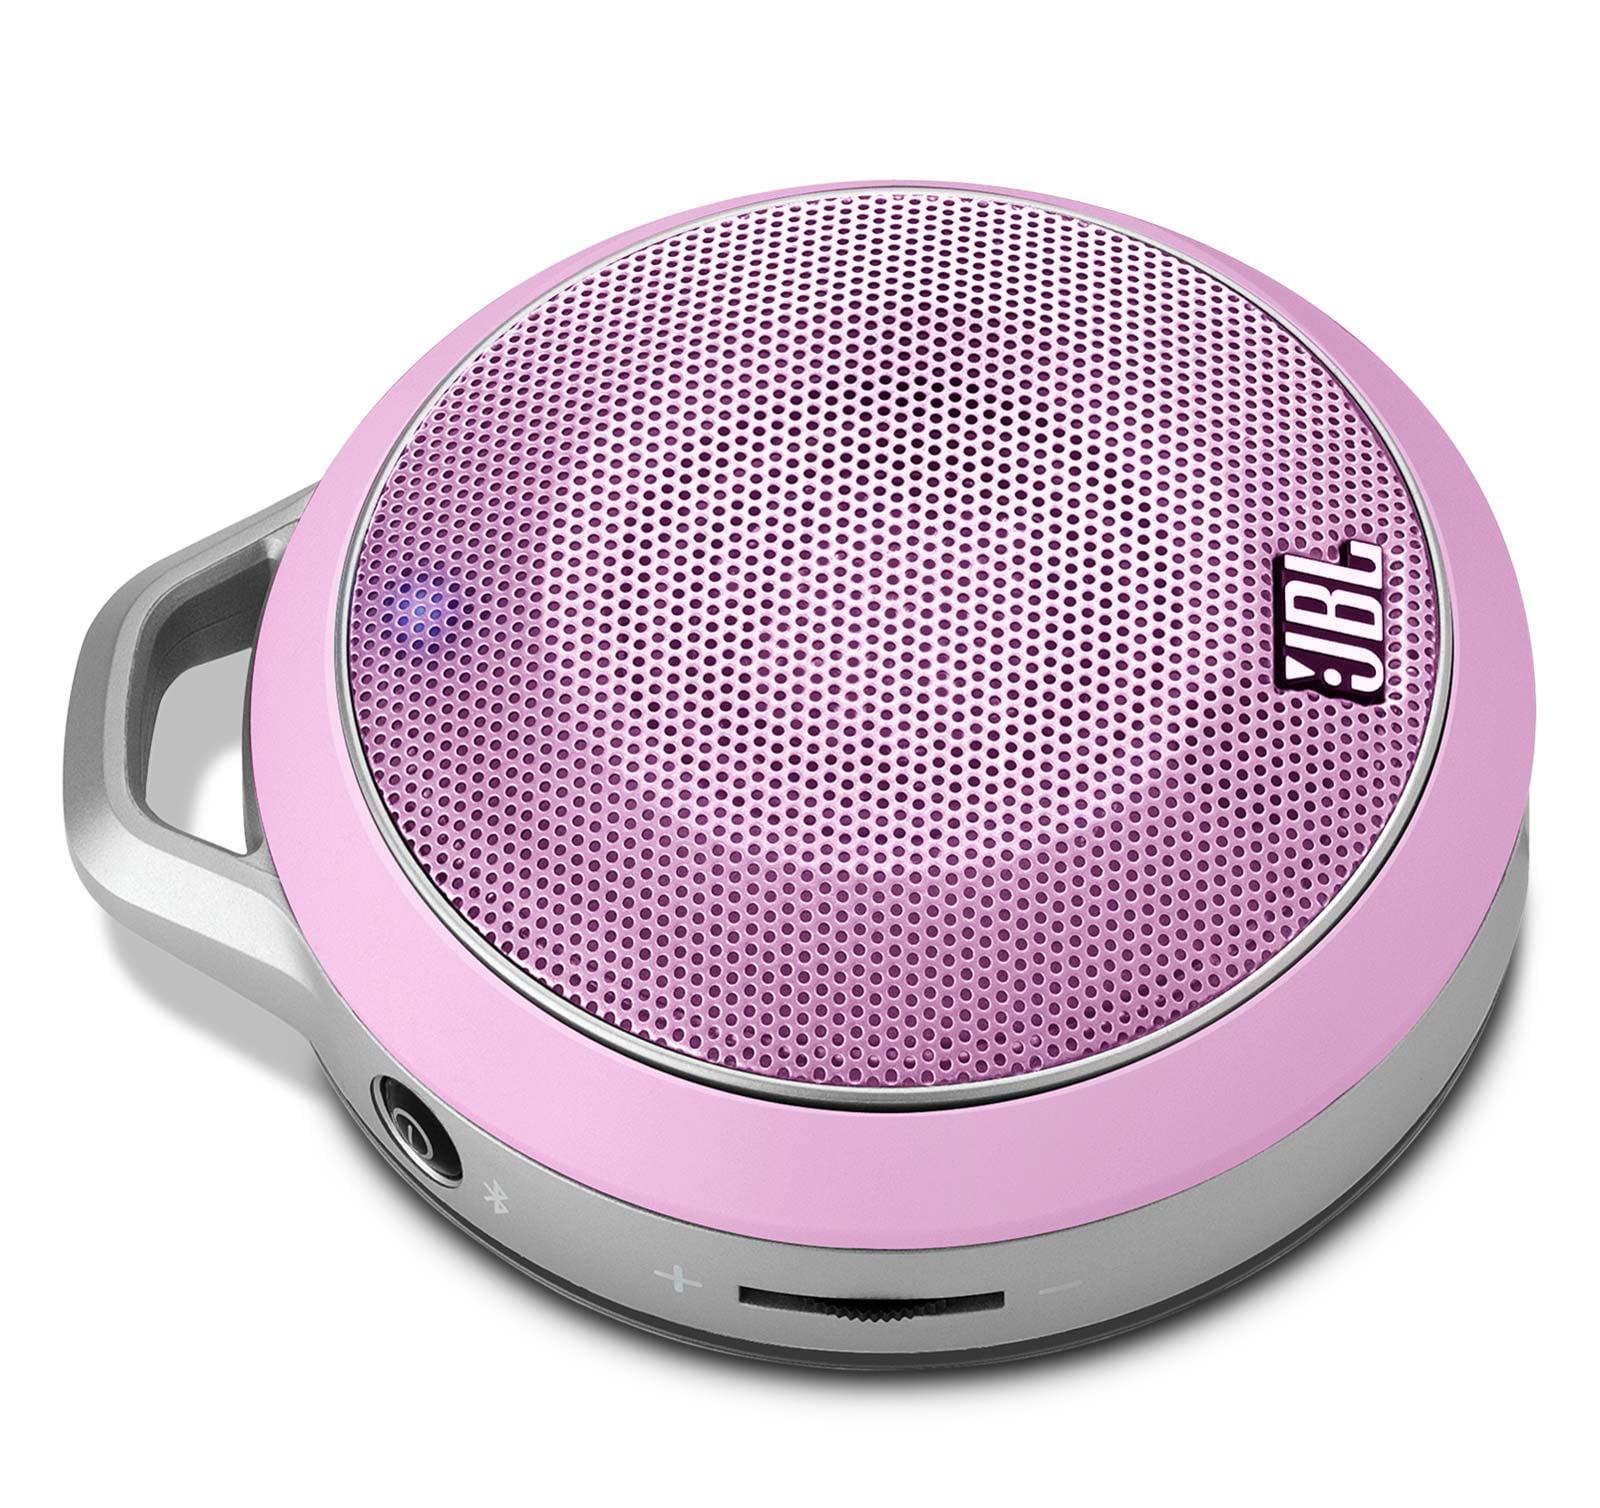 JBL Micro Wireless Pink Portable Bluetooth Speaker